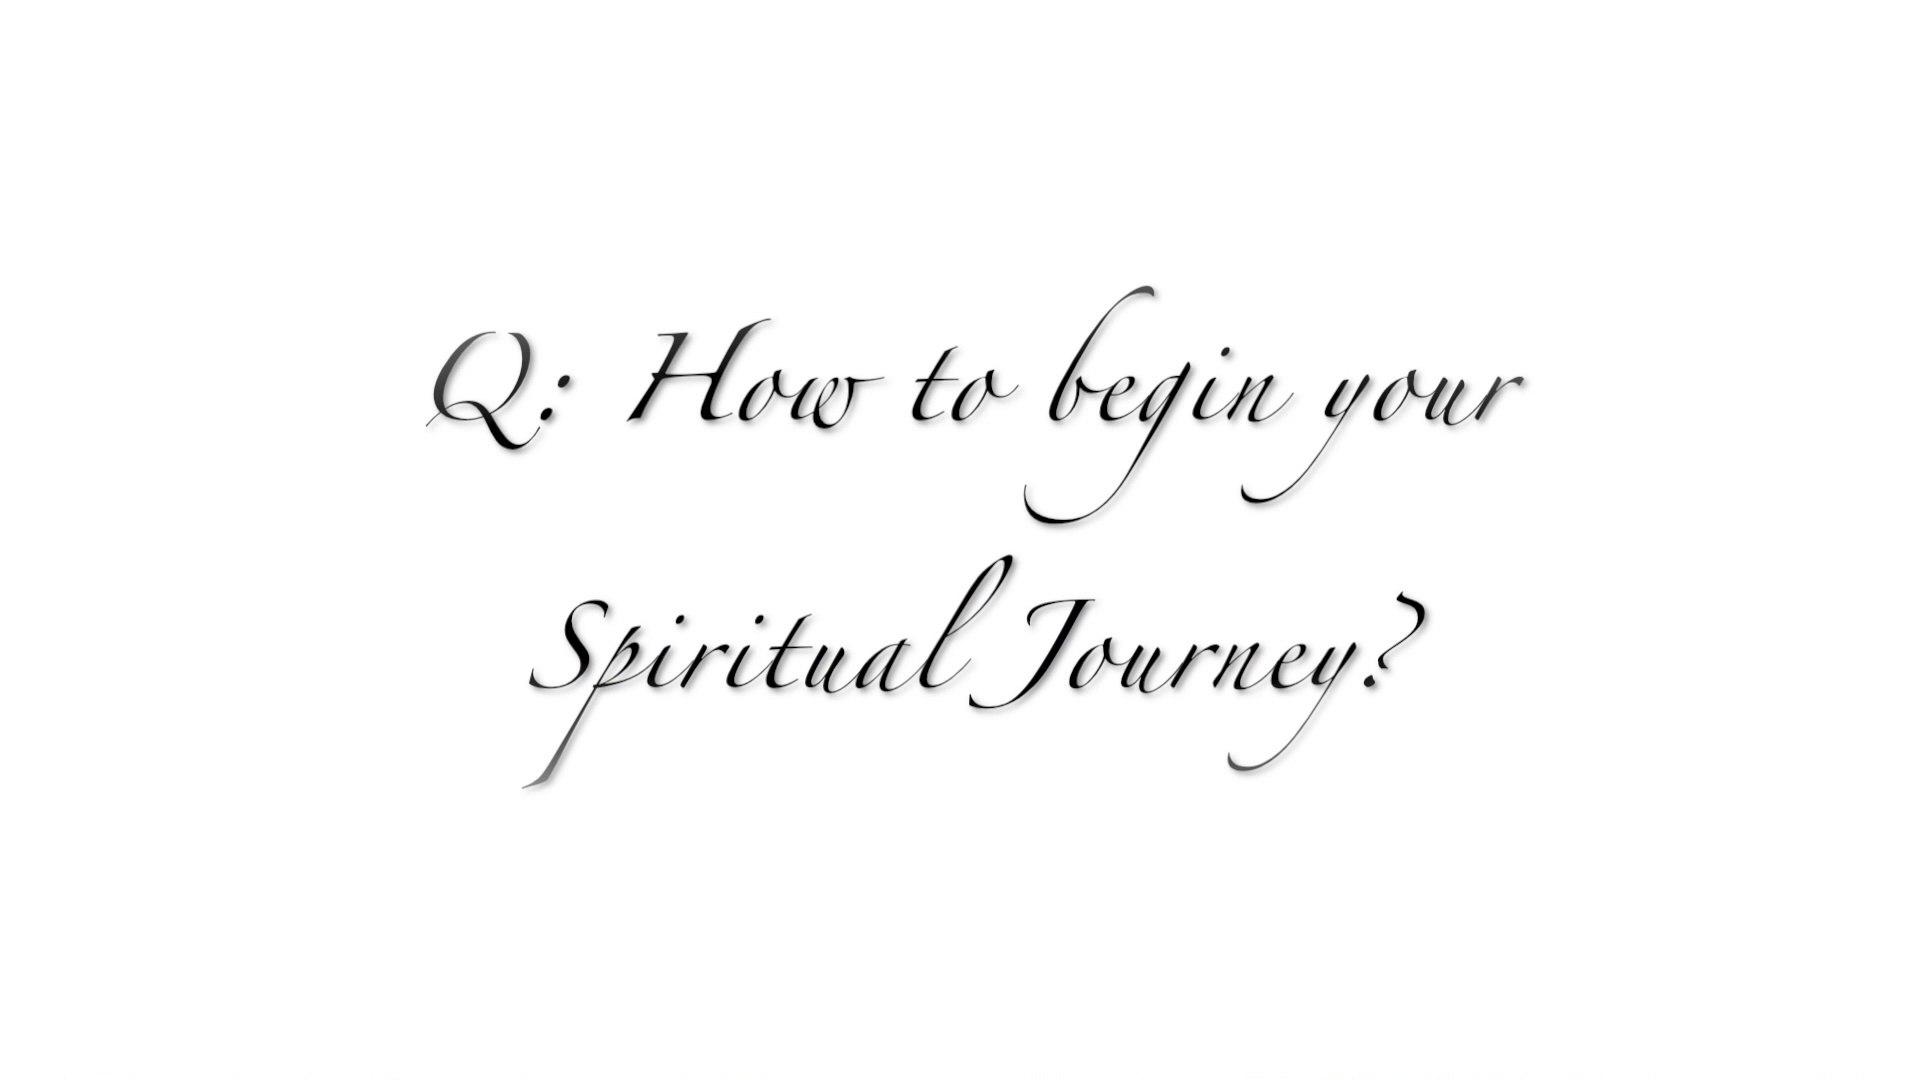 How To Begin Your Spiritual Journey?| Spiritual Quest | EP 07 | Spirituality 101 Series | KrsnaKnows